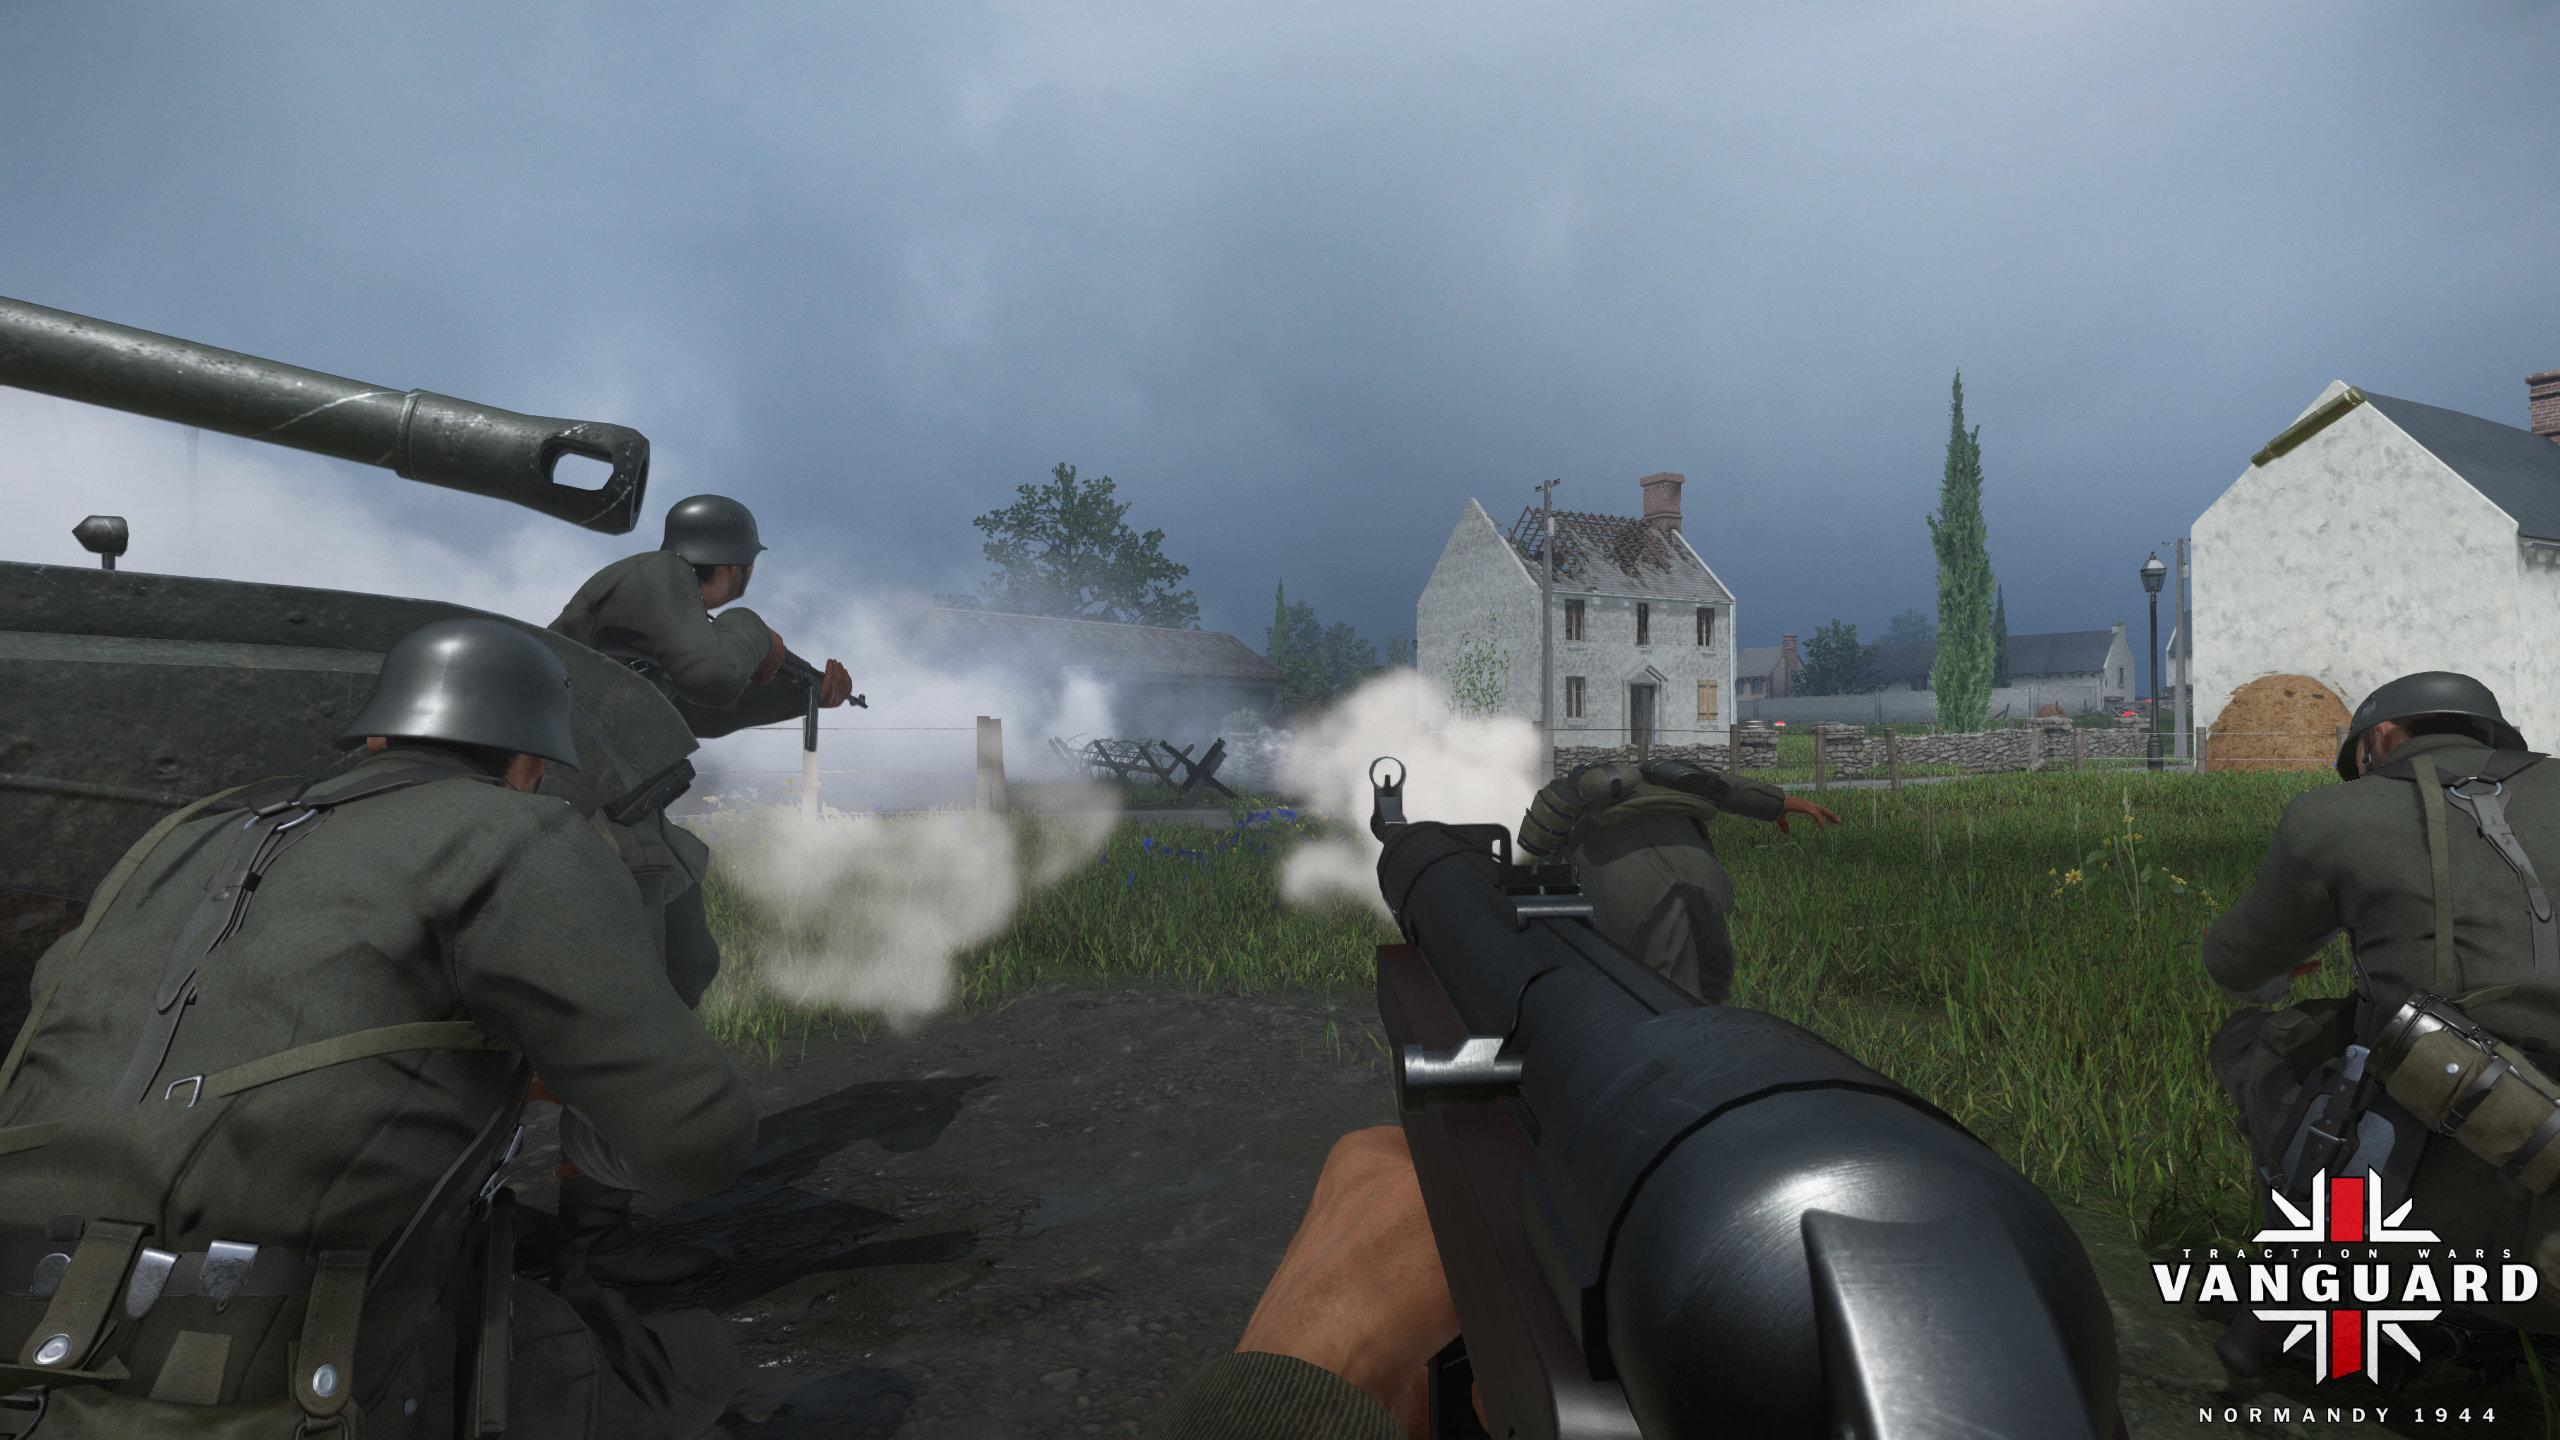 Press Info - Vanguard WWII Game